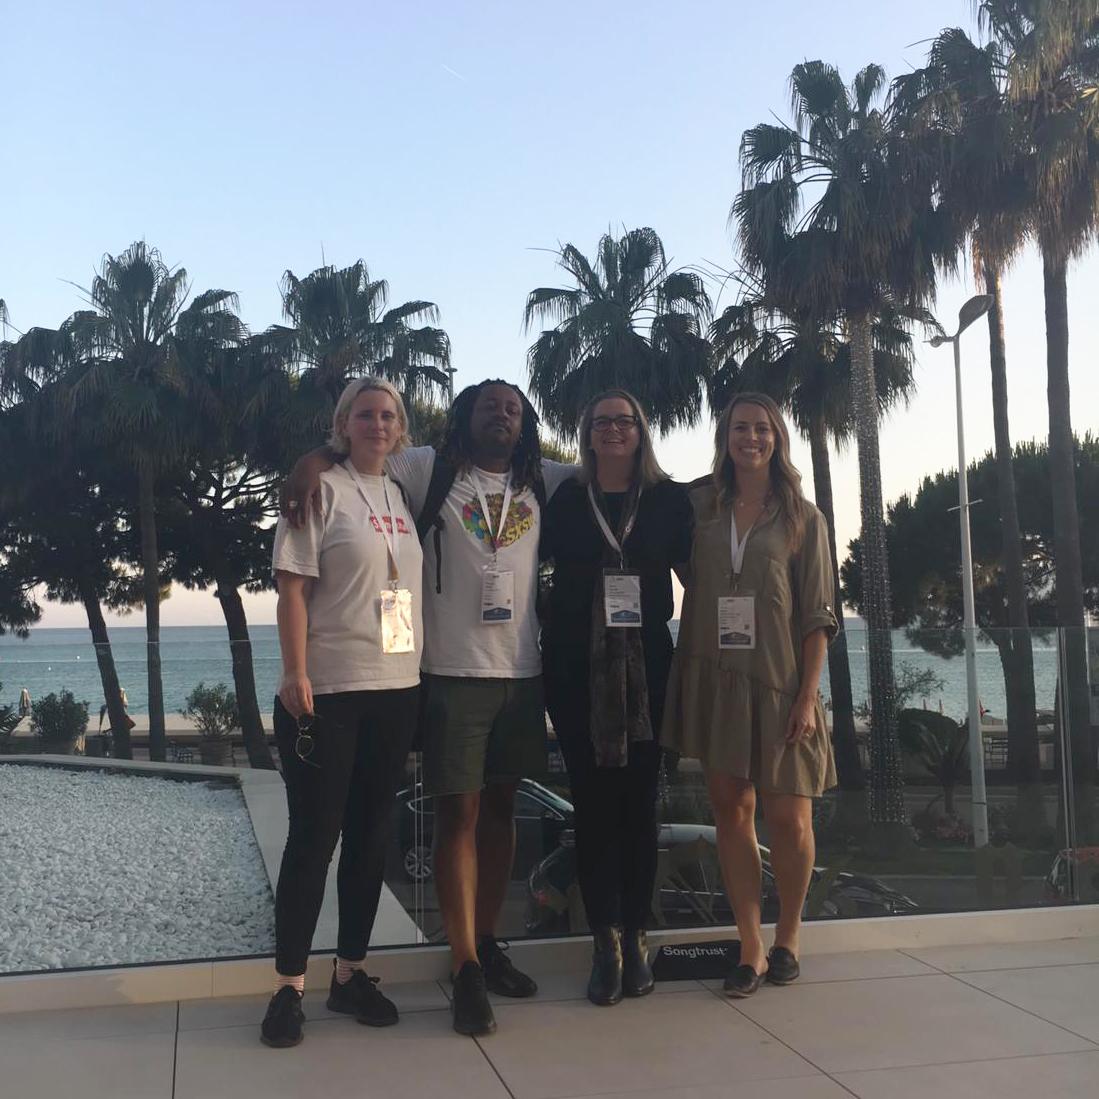 Photo: Jo Syme, Mo Komba, Bonnie Dalton and Rhianon Damas